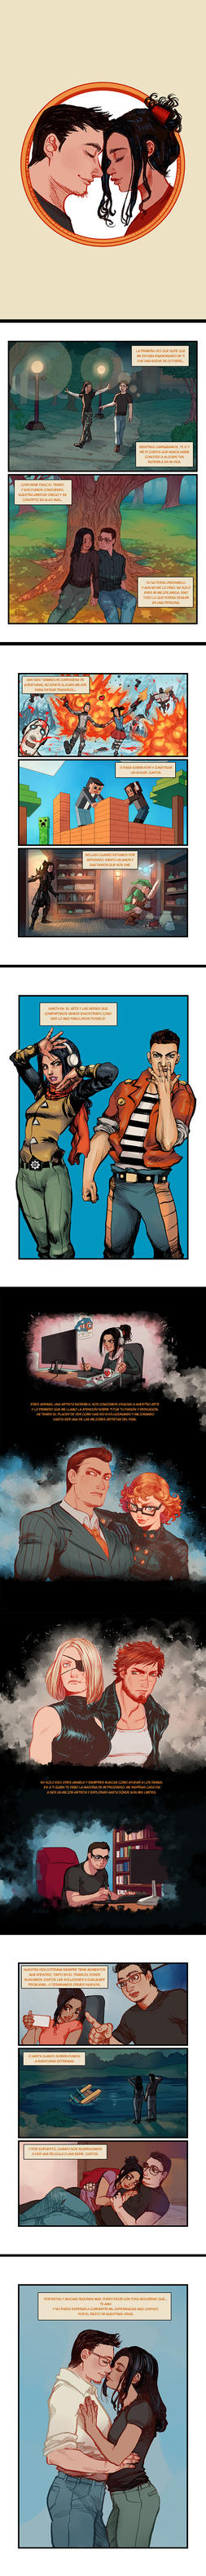 Comic de Matricidio! by Mephmmb